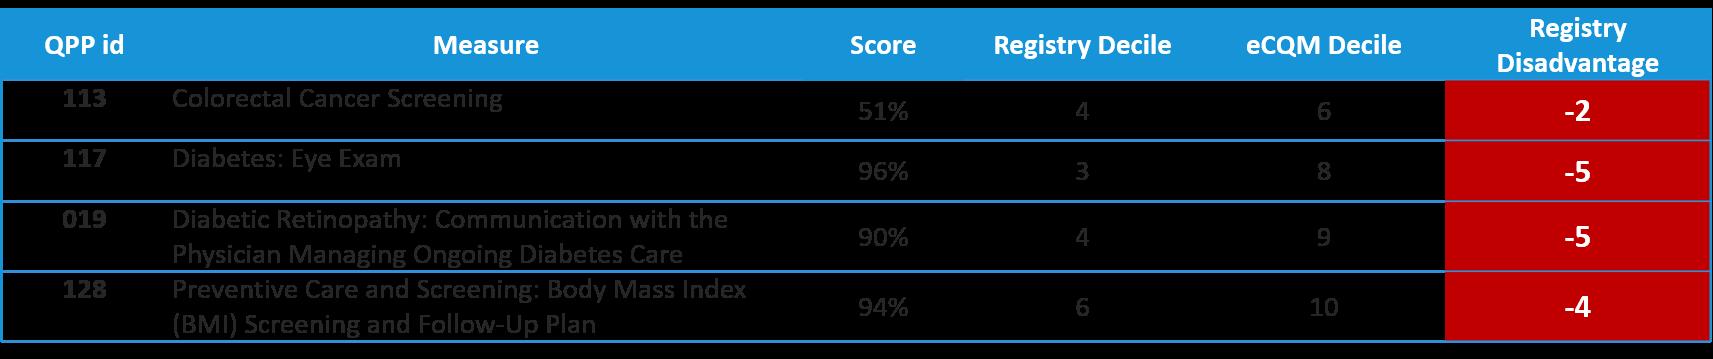 2019 Benchmarking_Registry vs eCQMs.png